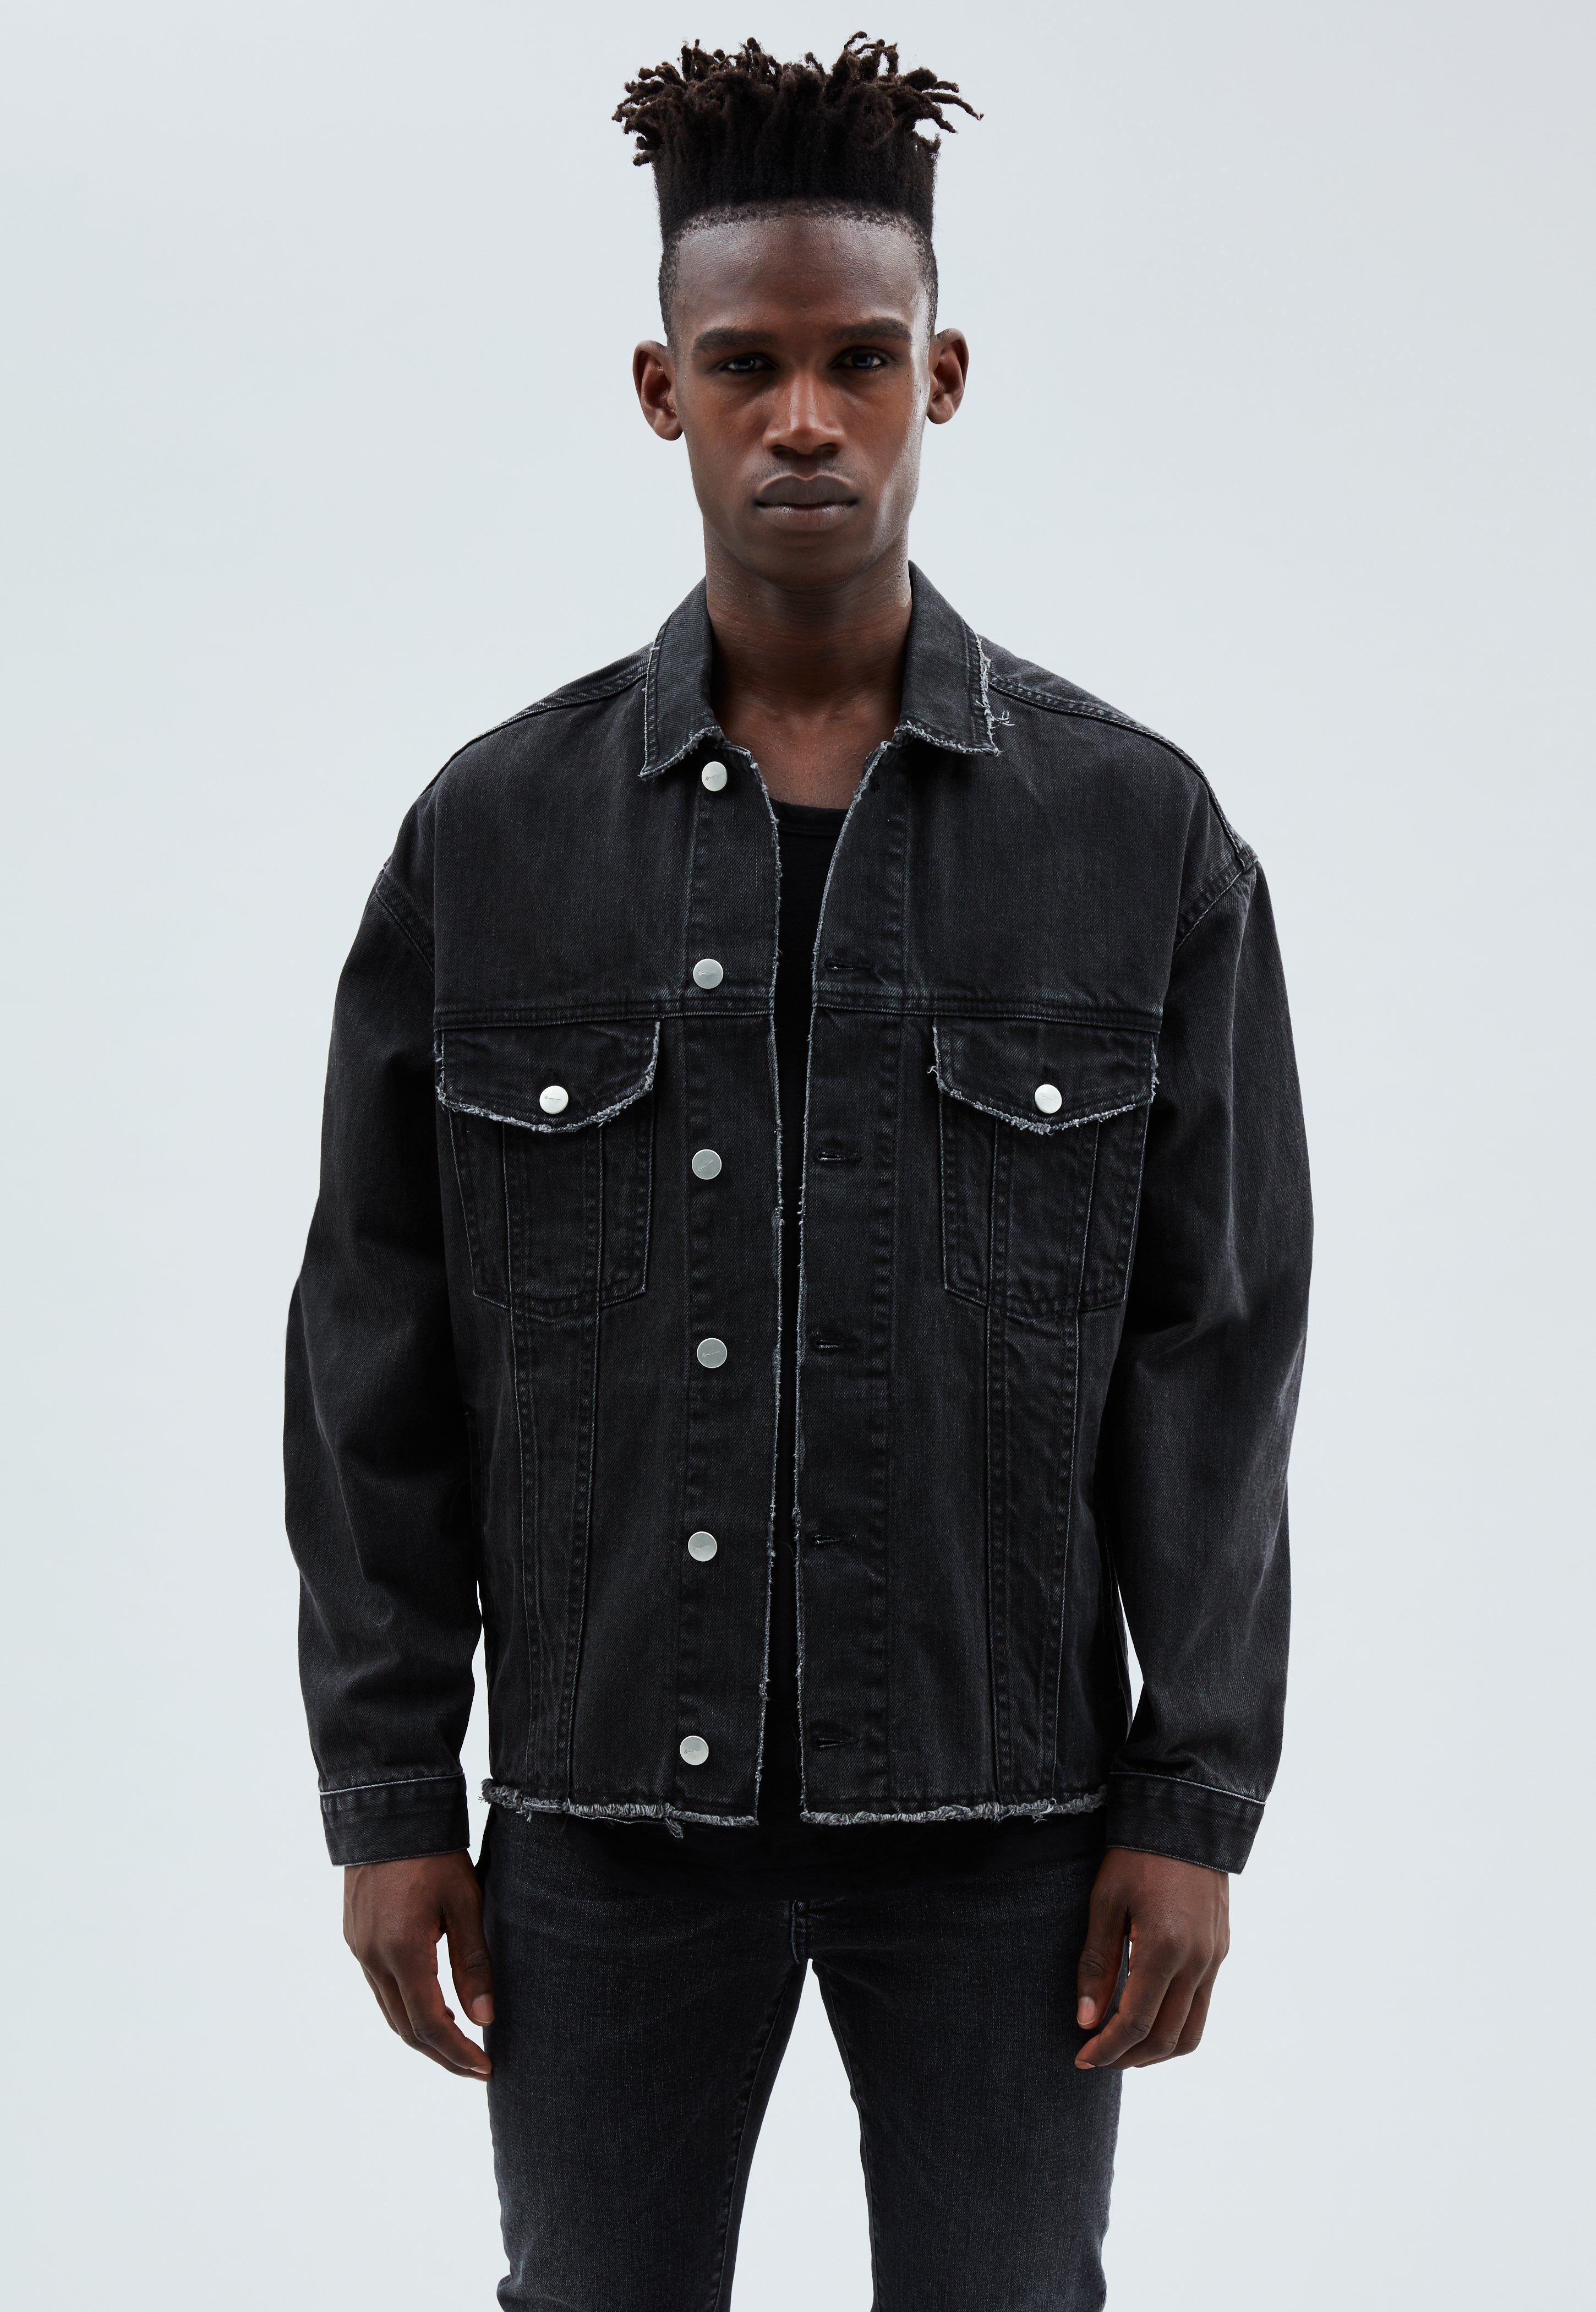 Men S Denim Jackets Denim Jackets For Men Online Mennace